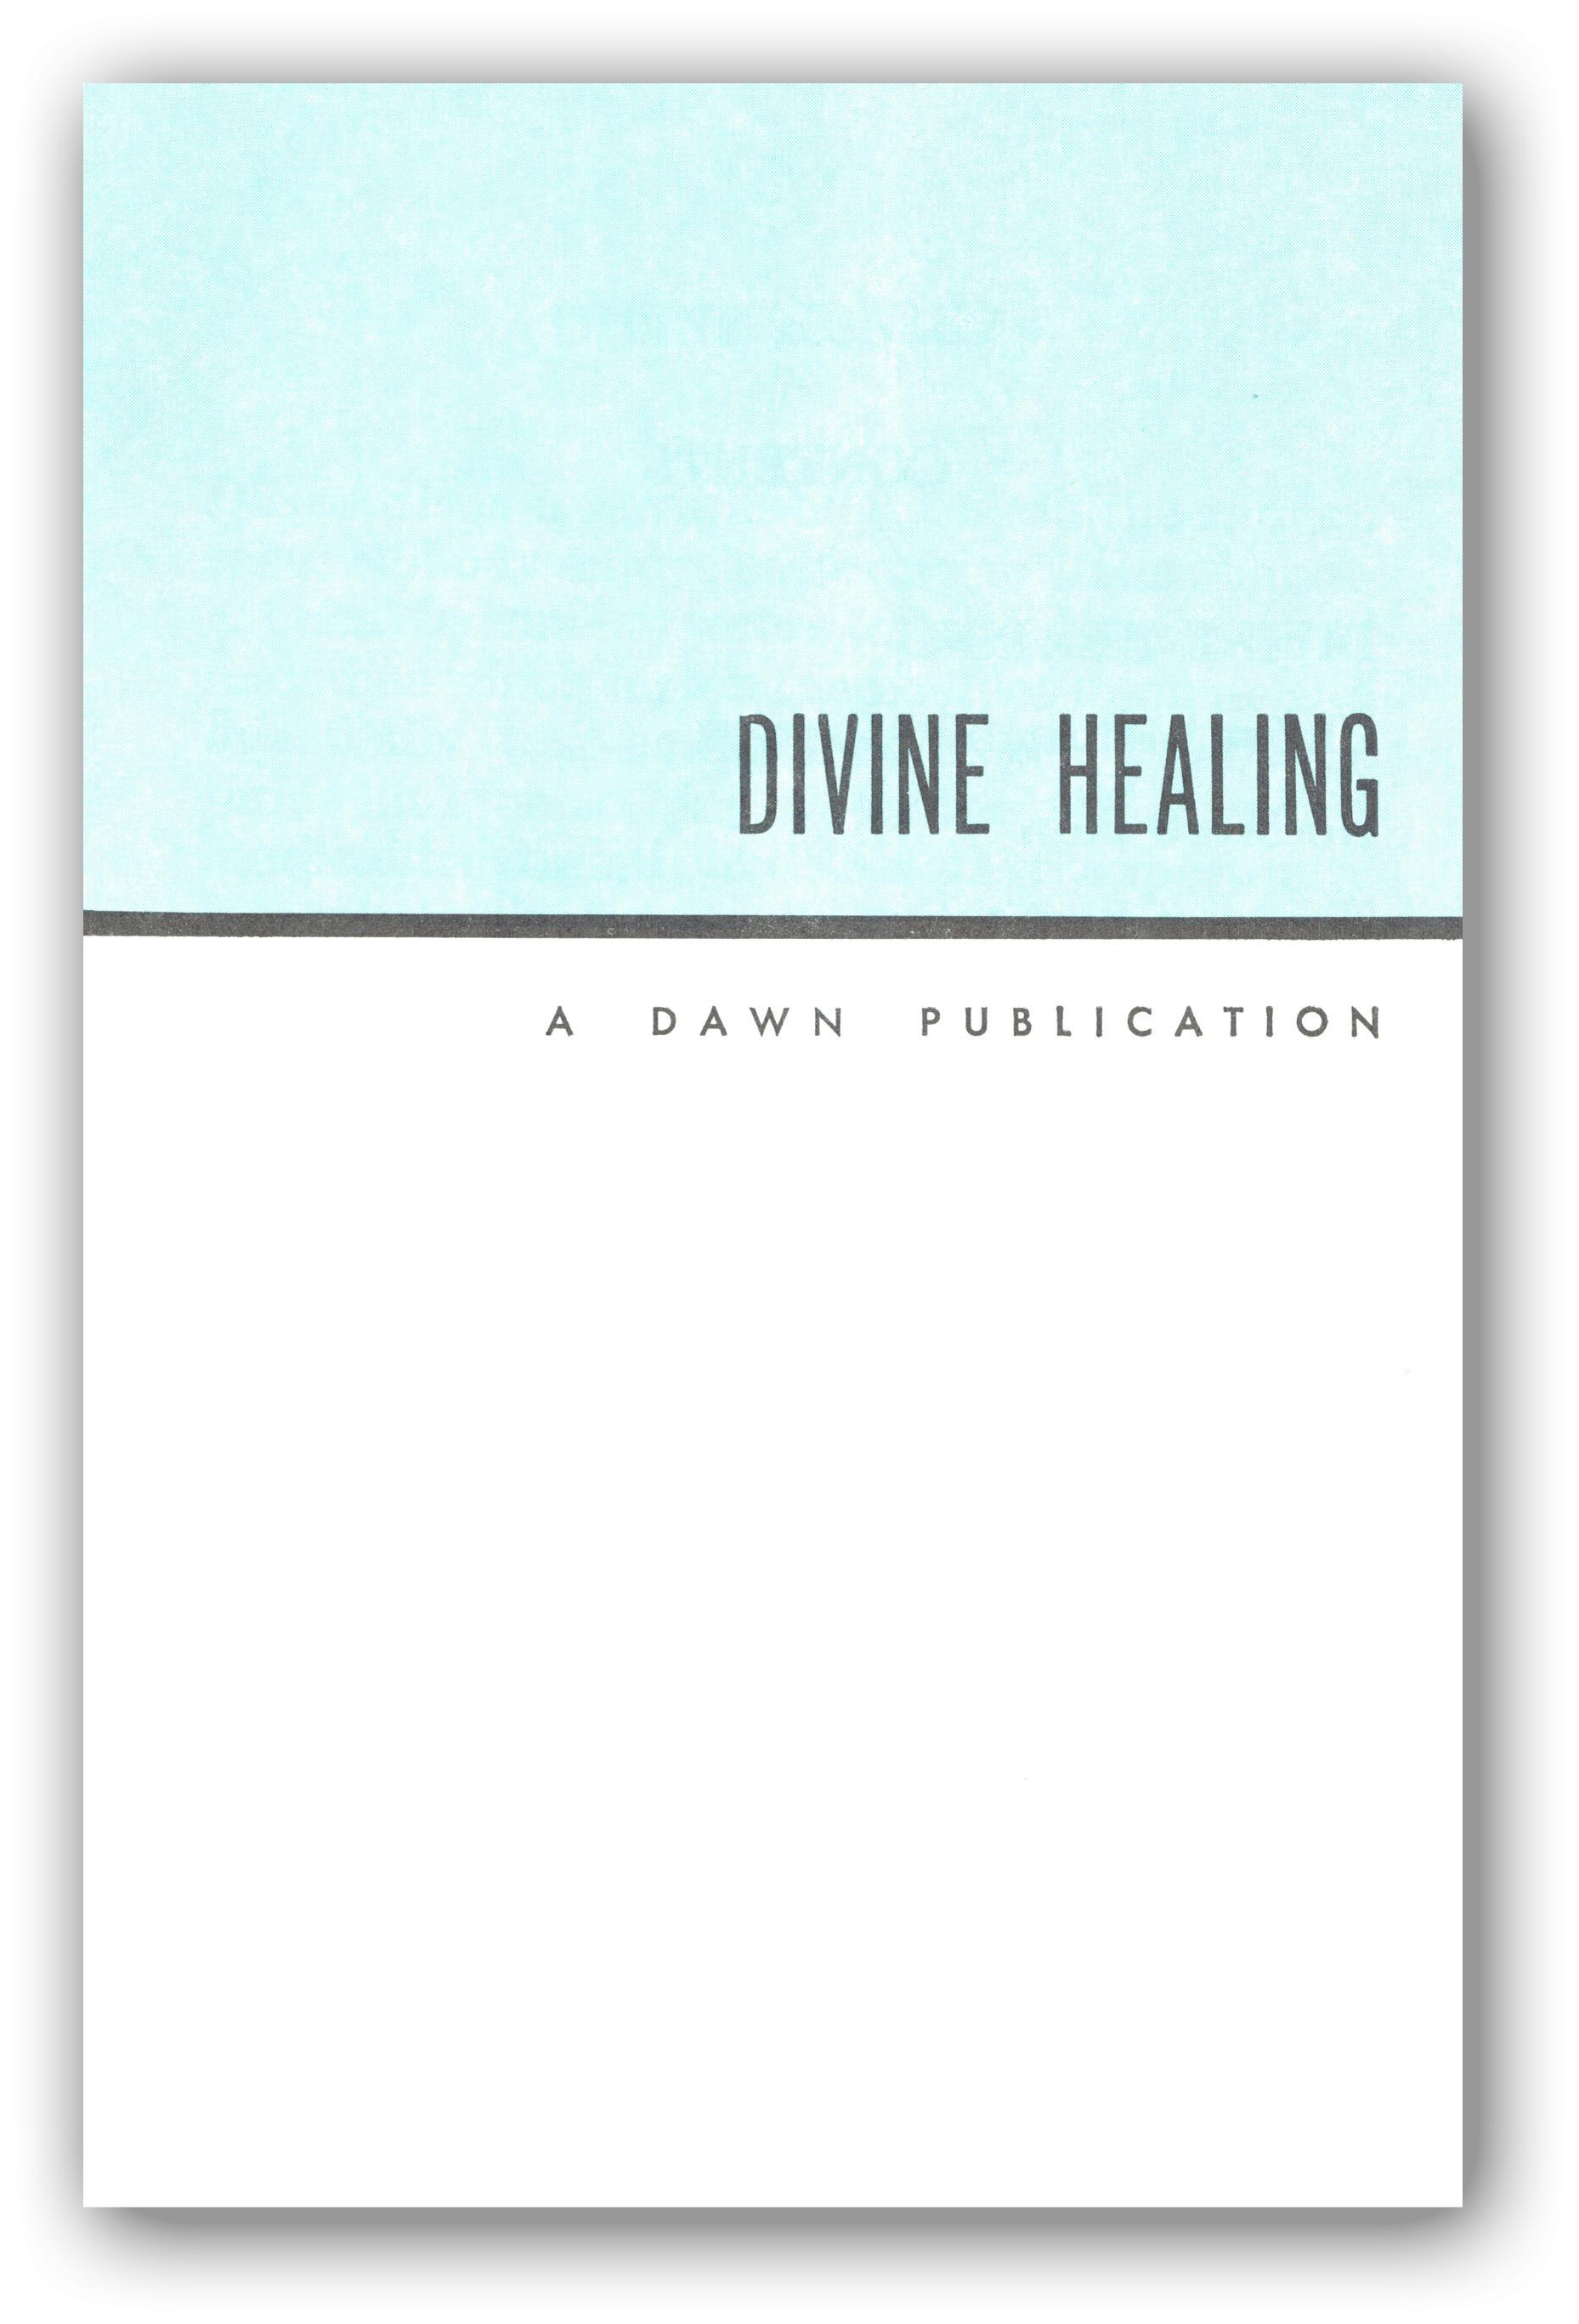 RobertDPace.com – A STUDY OF DIVINE HEALING